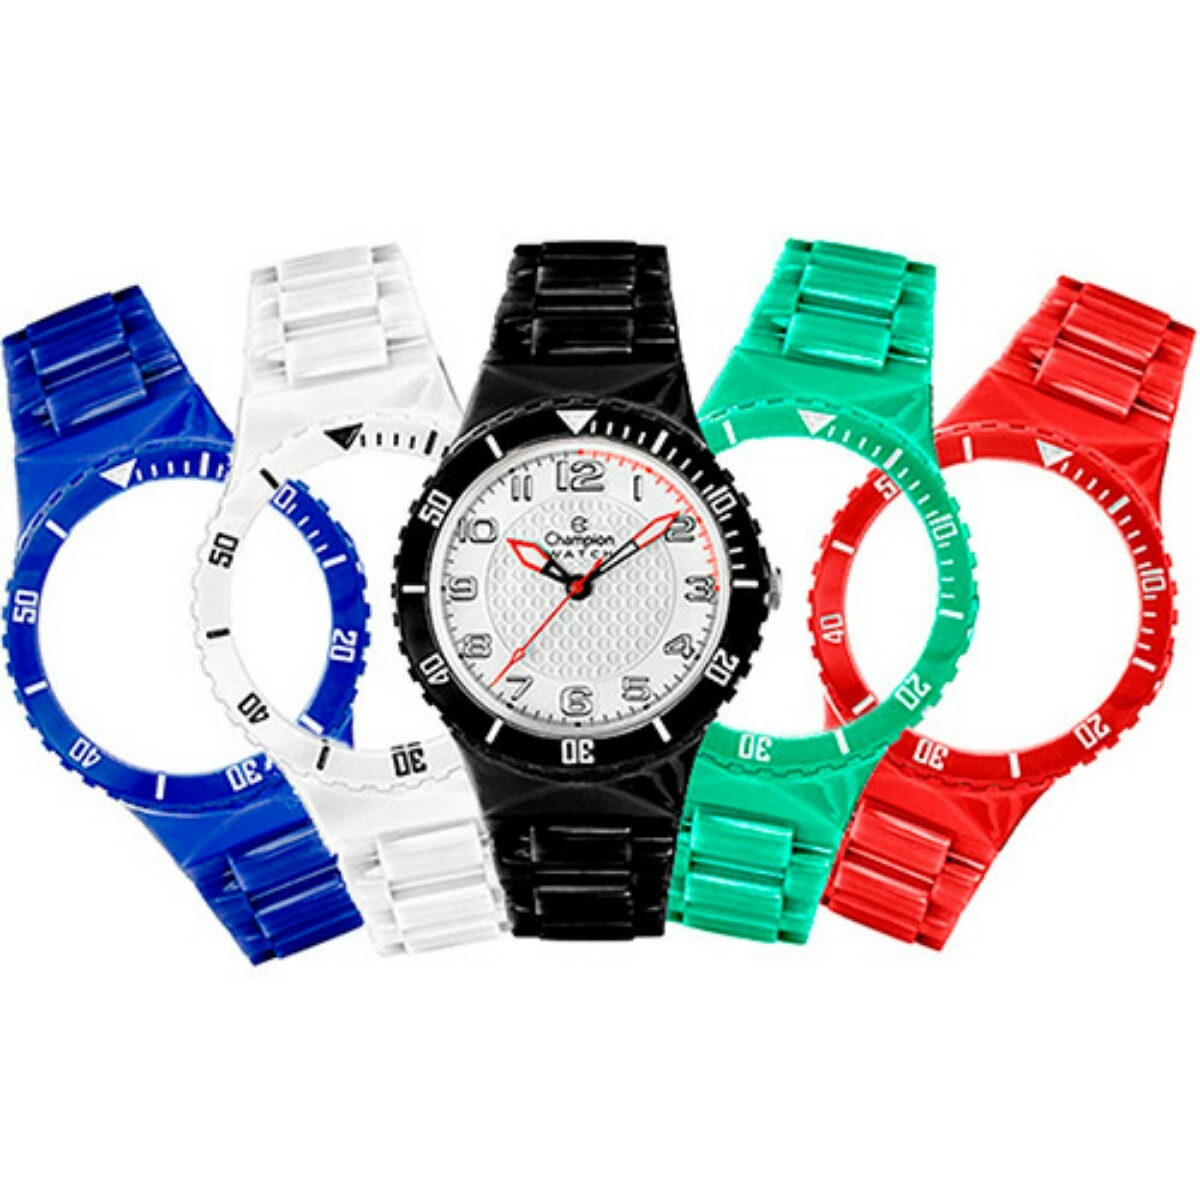 69a48265613 kit relógio champion troca pulseira cores frete grátis. Carregando zoom.